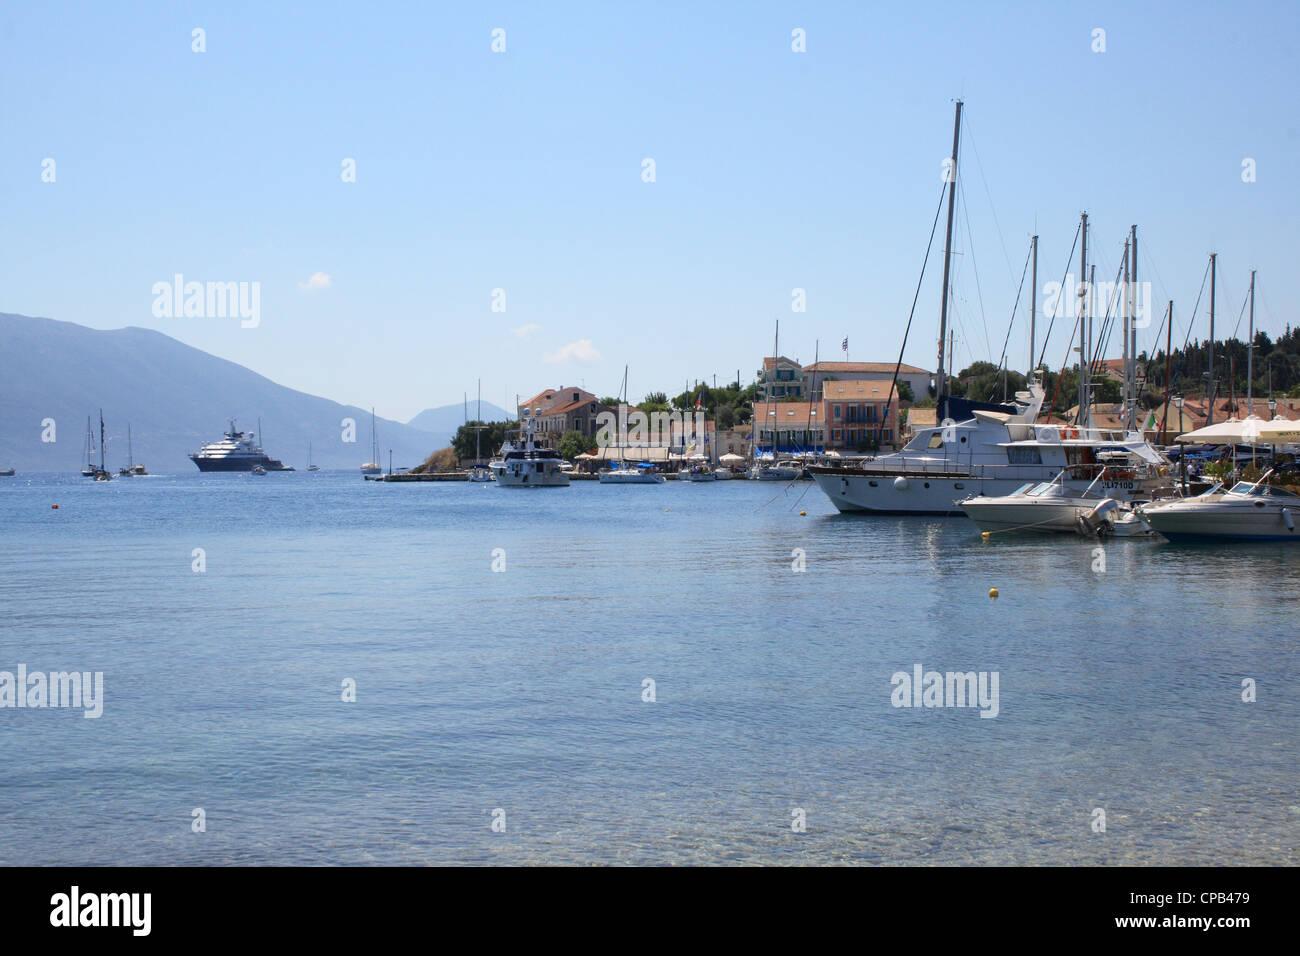 fiskardo, kefalonia, greece, port, 'ionian, islands' - Stock Image